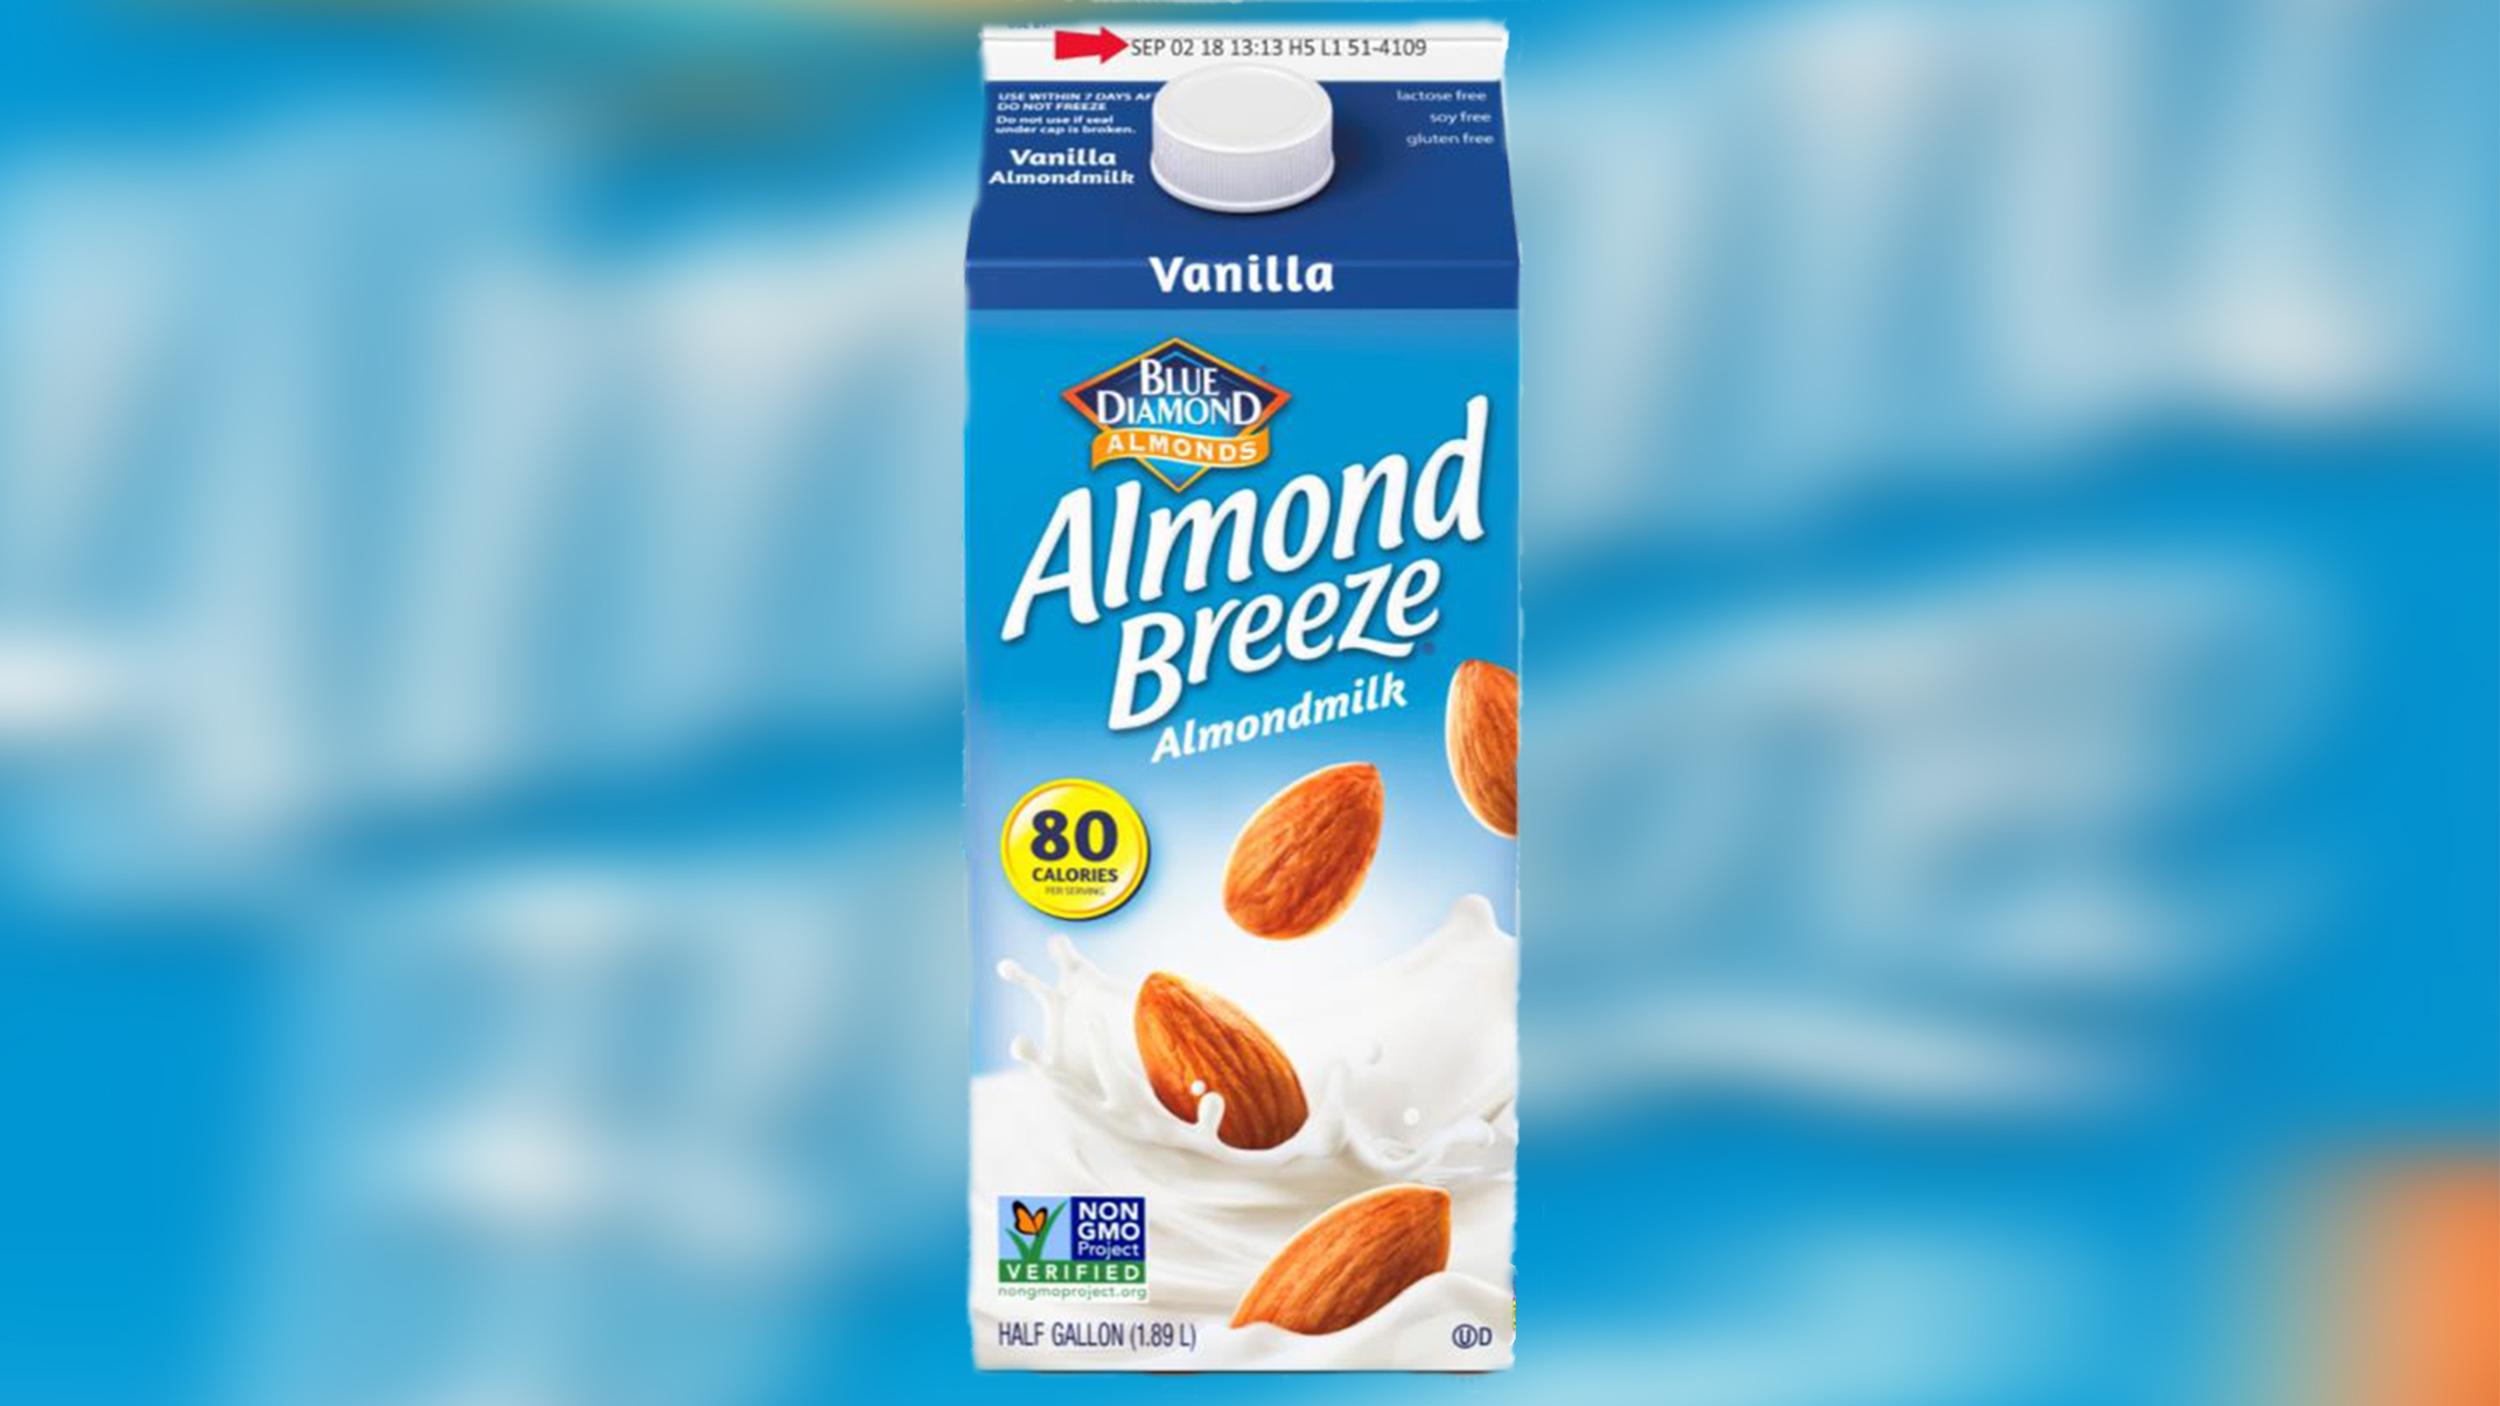 Almond Breeze almond milk recalled